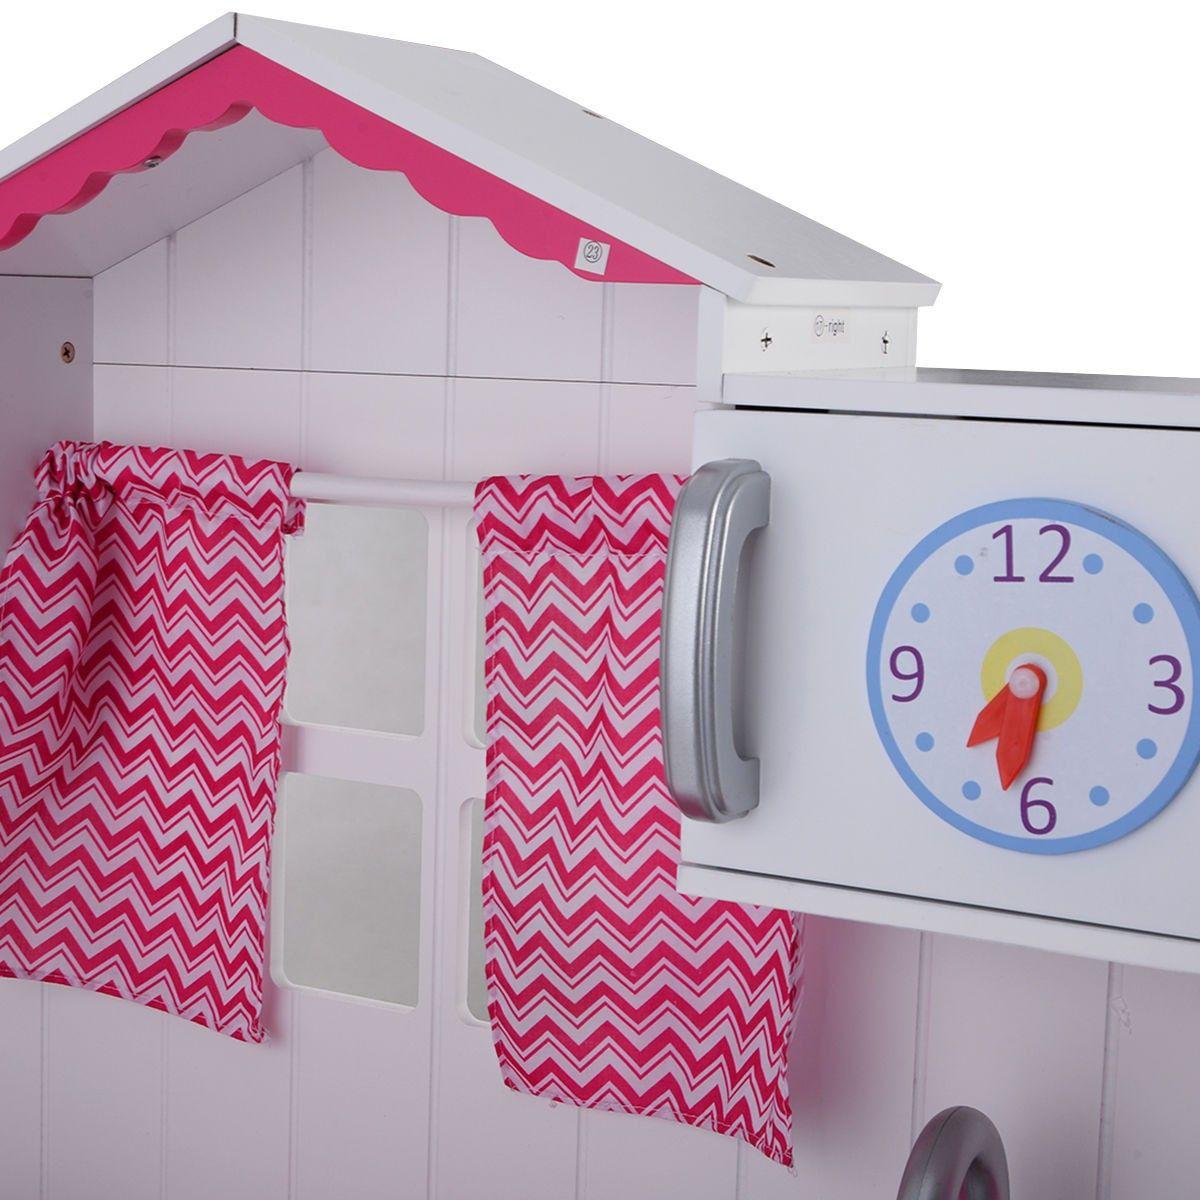 Wood Kitchen Toy Kids Cooking Pretend Play Set Toddler Wooden Playset Gift - Kitchen & Dining - Home & Garden